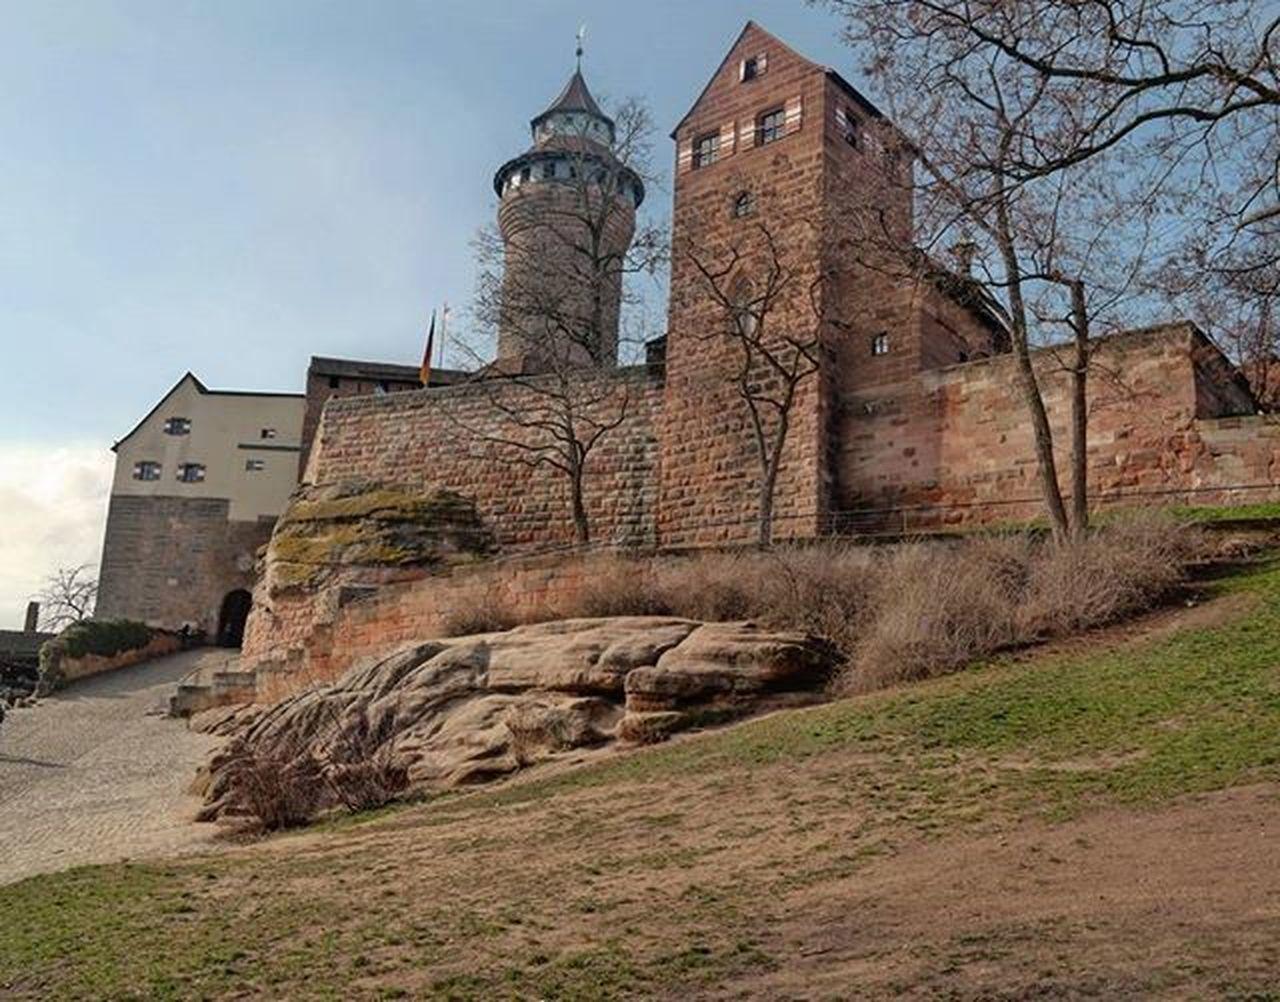 Nuremberg's castle in (pre)spring Nuremberg Nürnberg Kaiserburg Spring Bavaria Bayern Germany Itbberlin Itbberlin2016 Samsungnx300